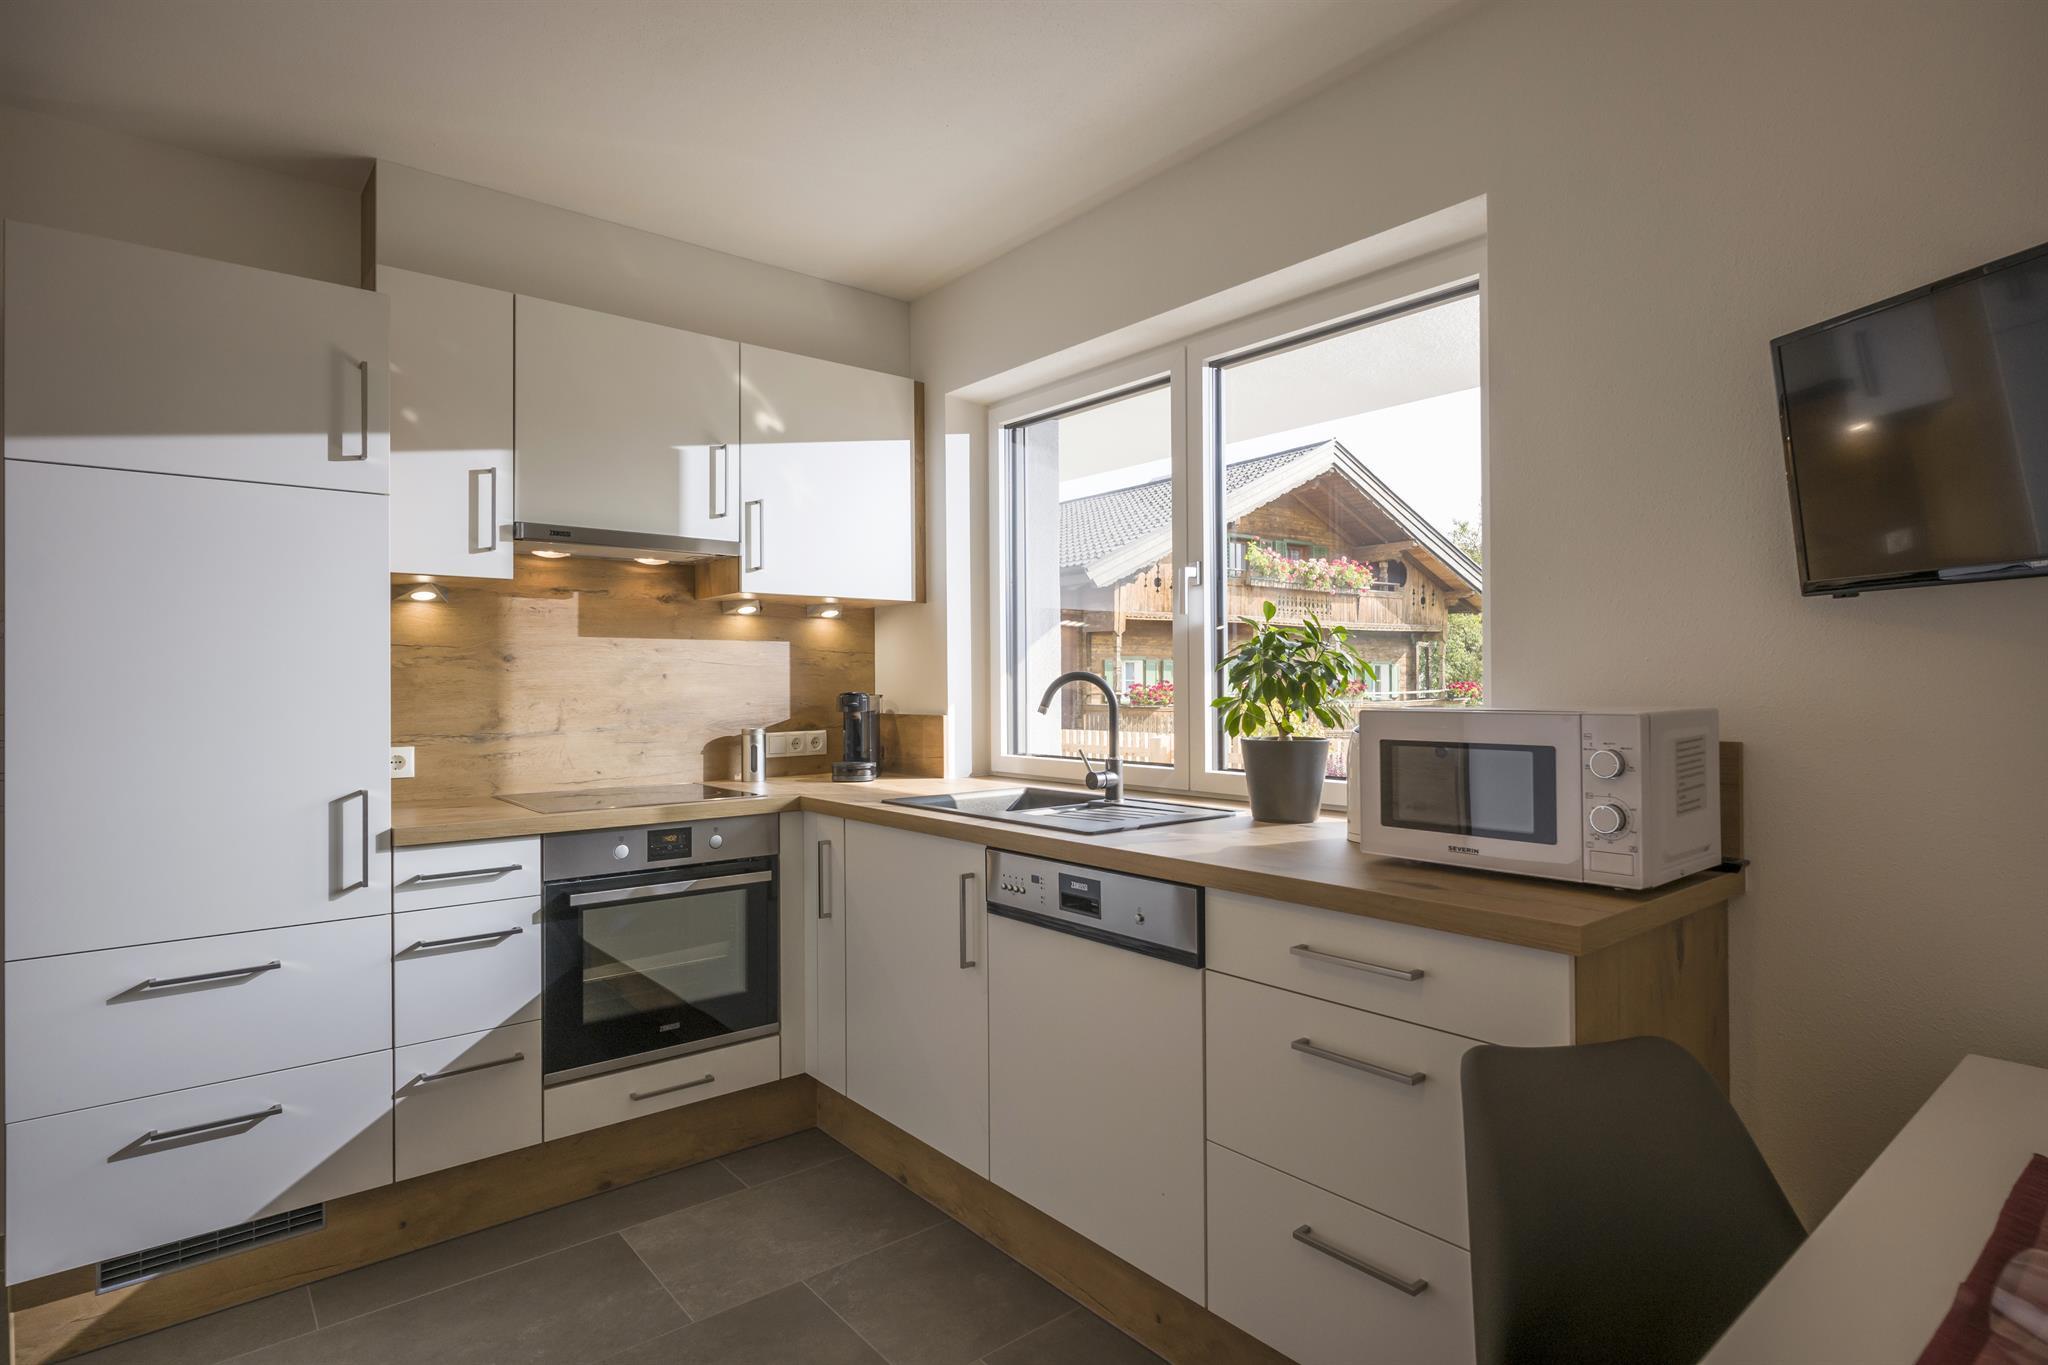 Appartement de vacances Appartement de Jager Appartement/Fewo, Bad, WC, 1 Schlafraum (2613433), Söll, Wilder Kaiser, Tyrol, Autriche, image 20